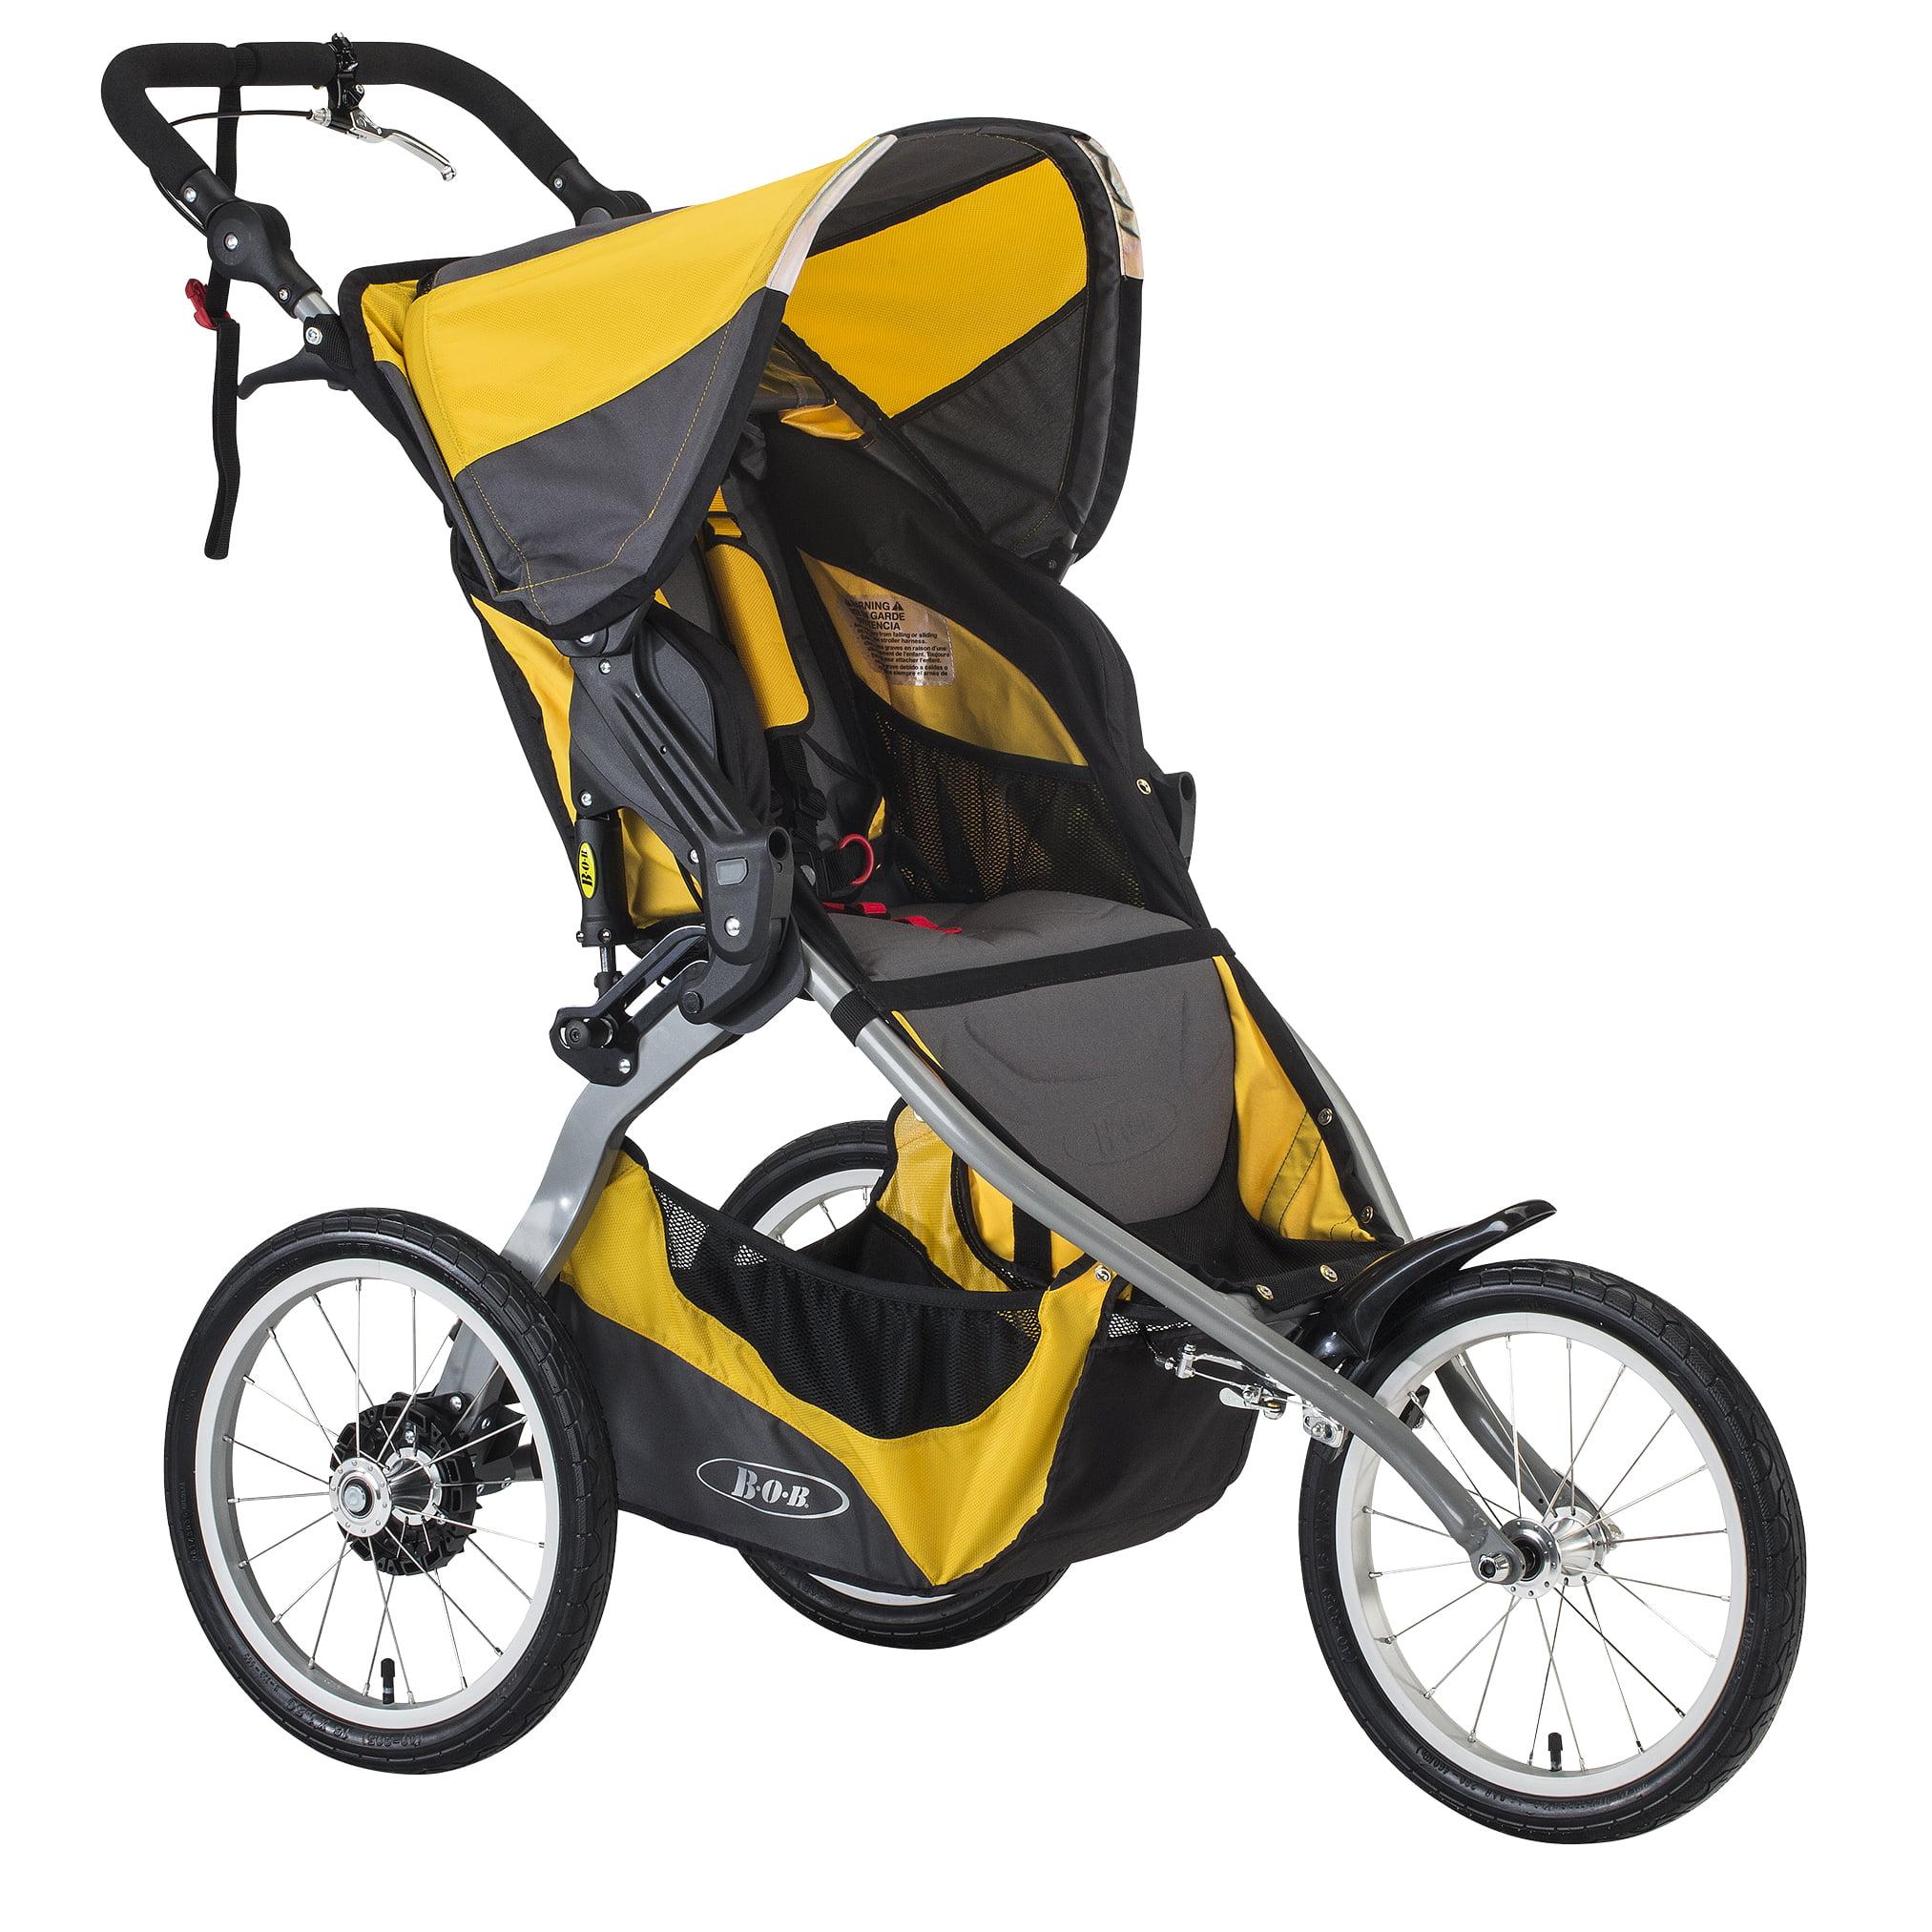 Britax BOB Ironman Single Jogging Stroller - Yellow